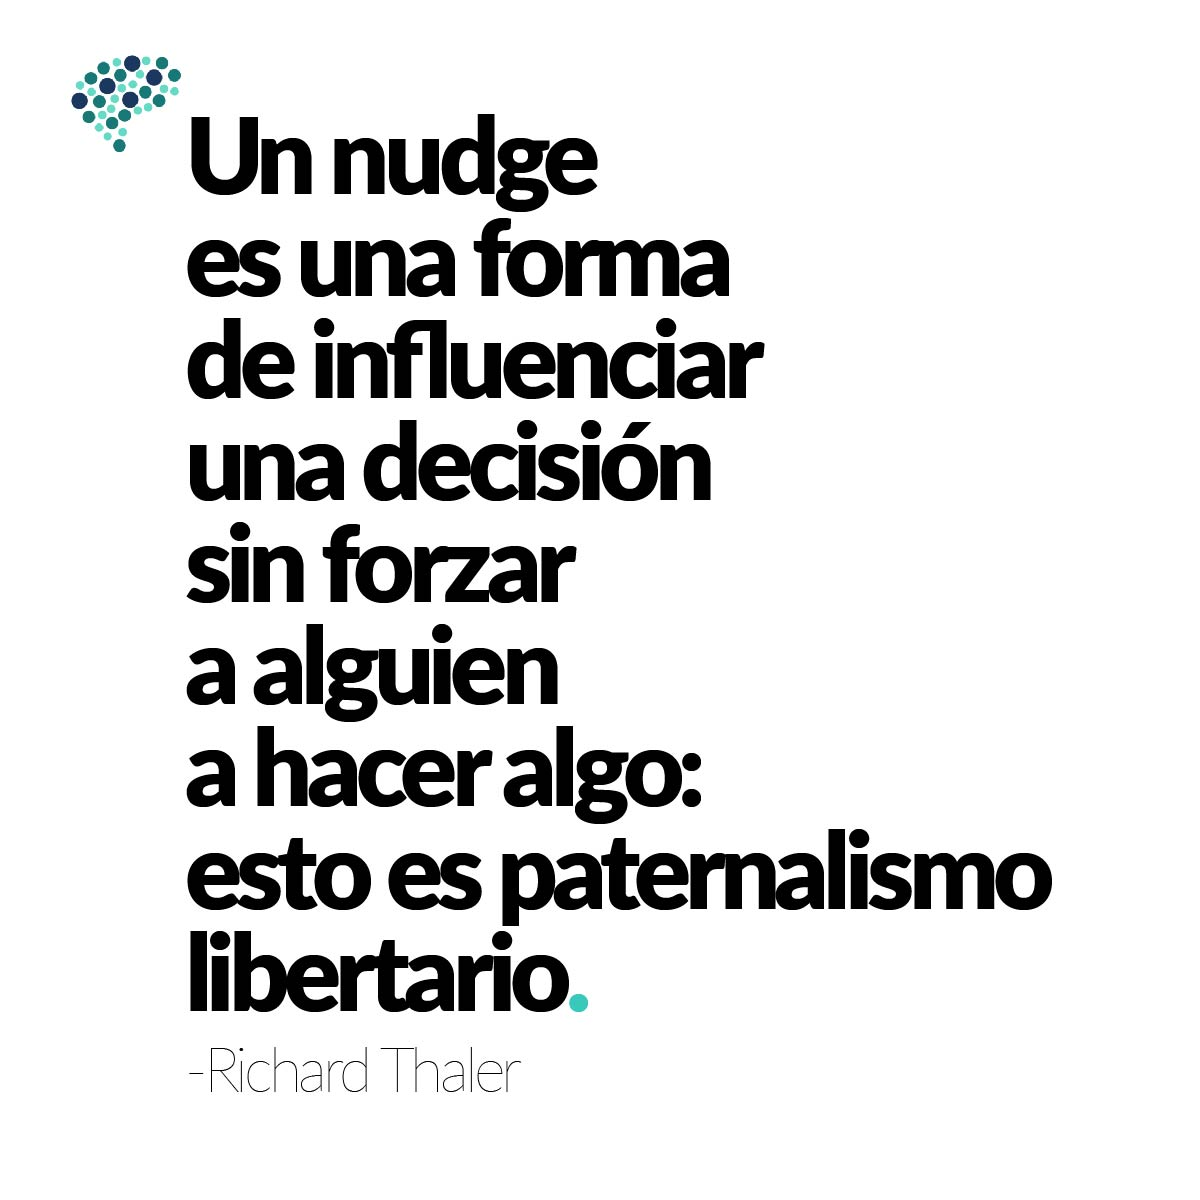 Richard Thaler_3.jpg